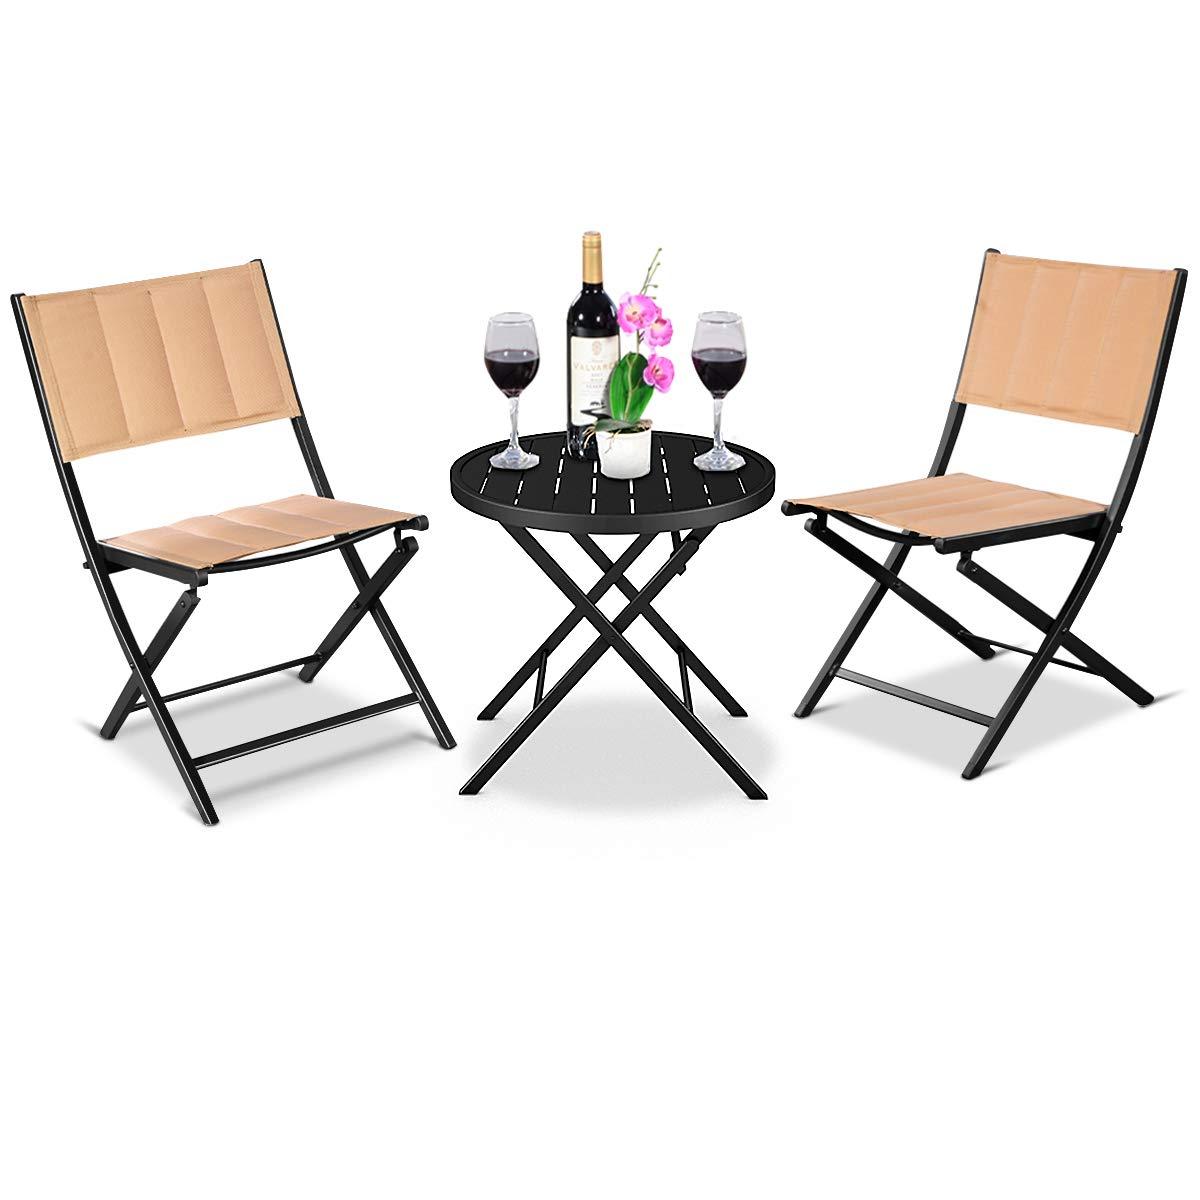 Giantex 3PCS Patio Folding Table Chairs Furniture Set Bistro Garden Steel